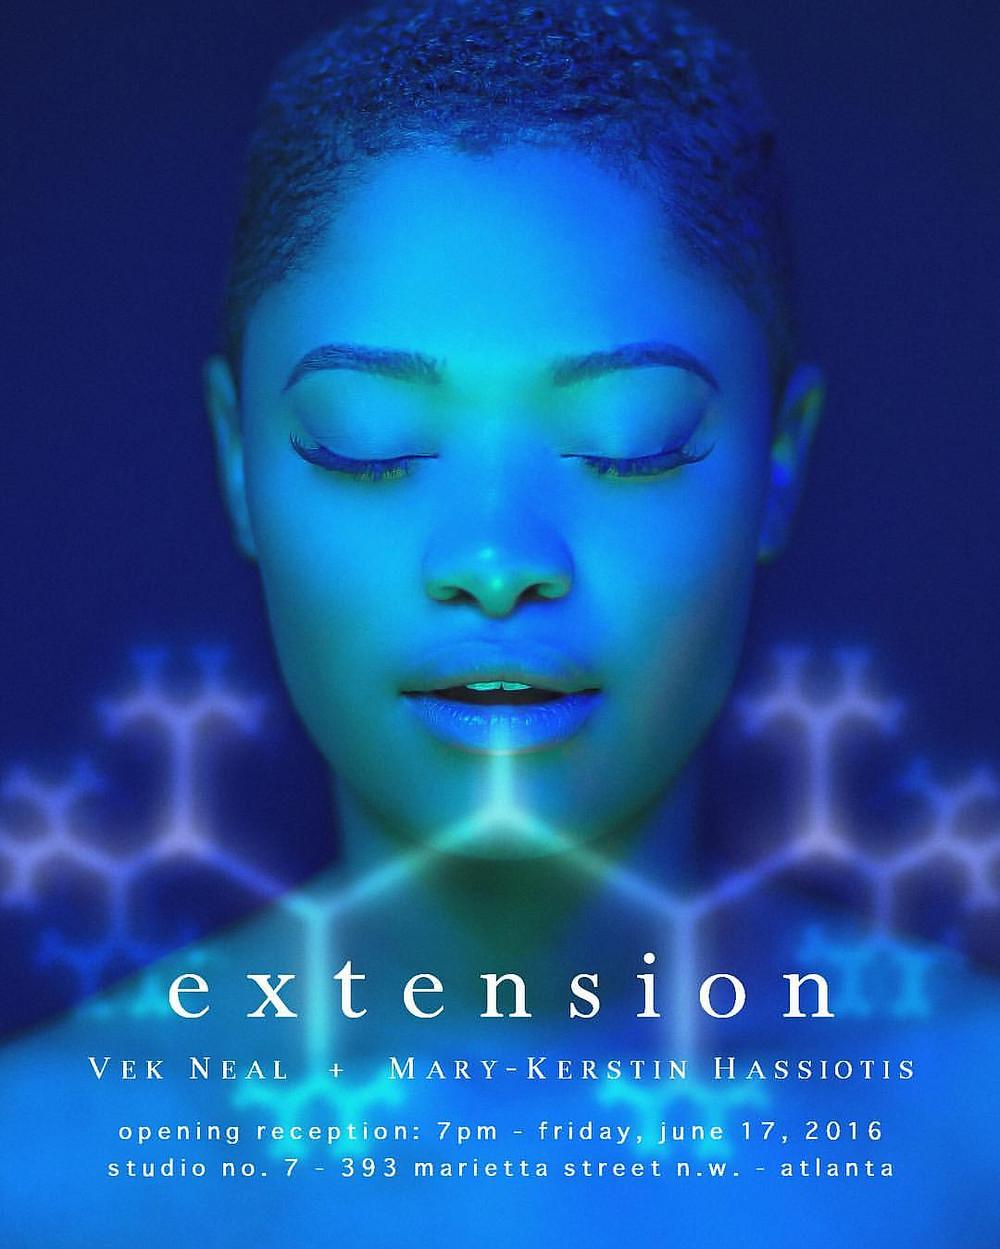 Extension Art Exhibition